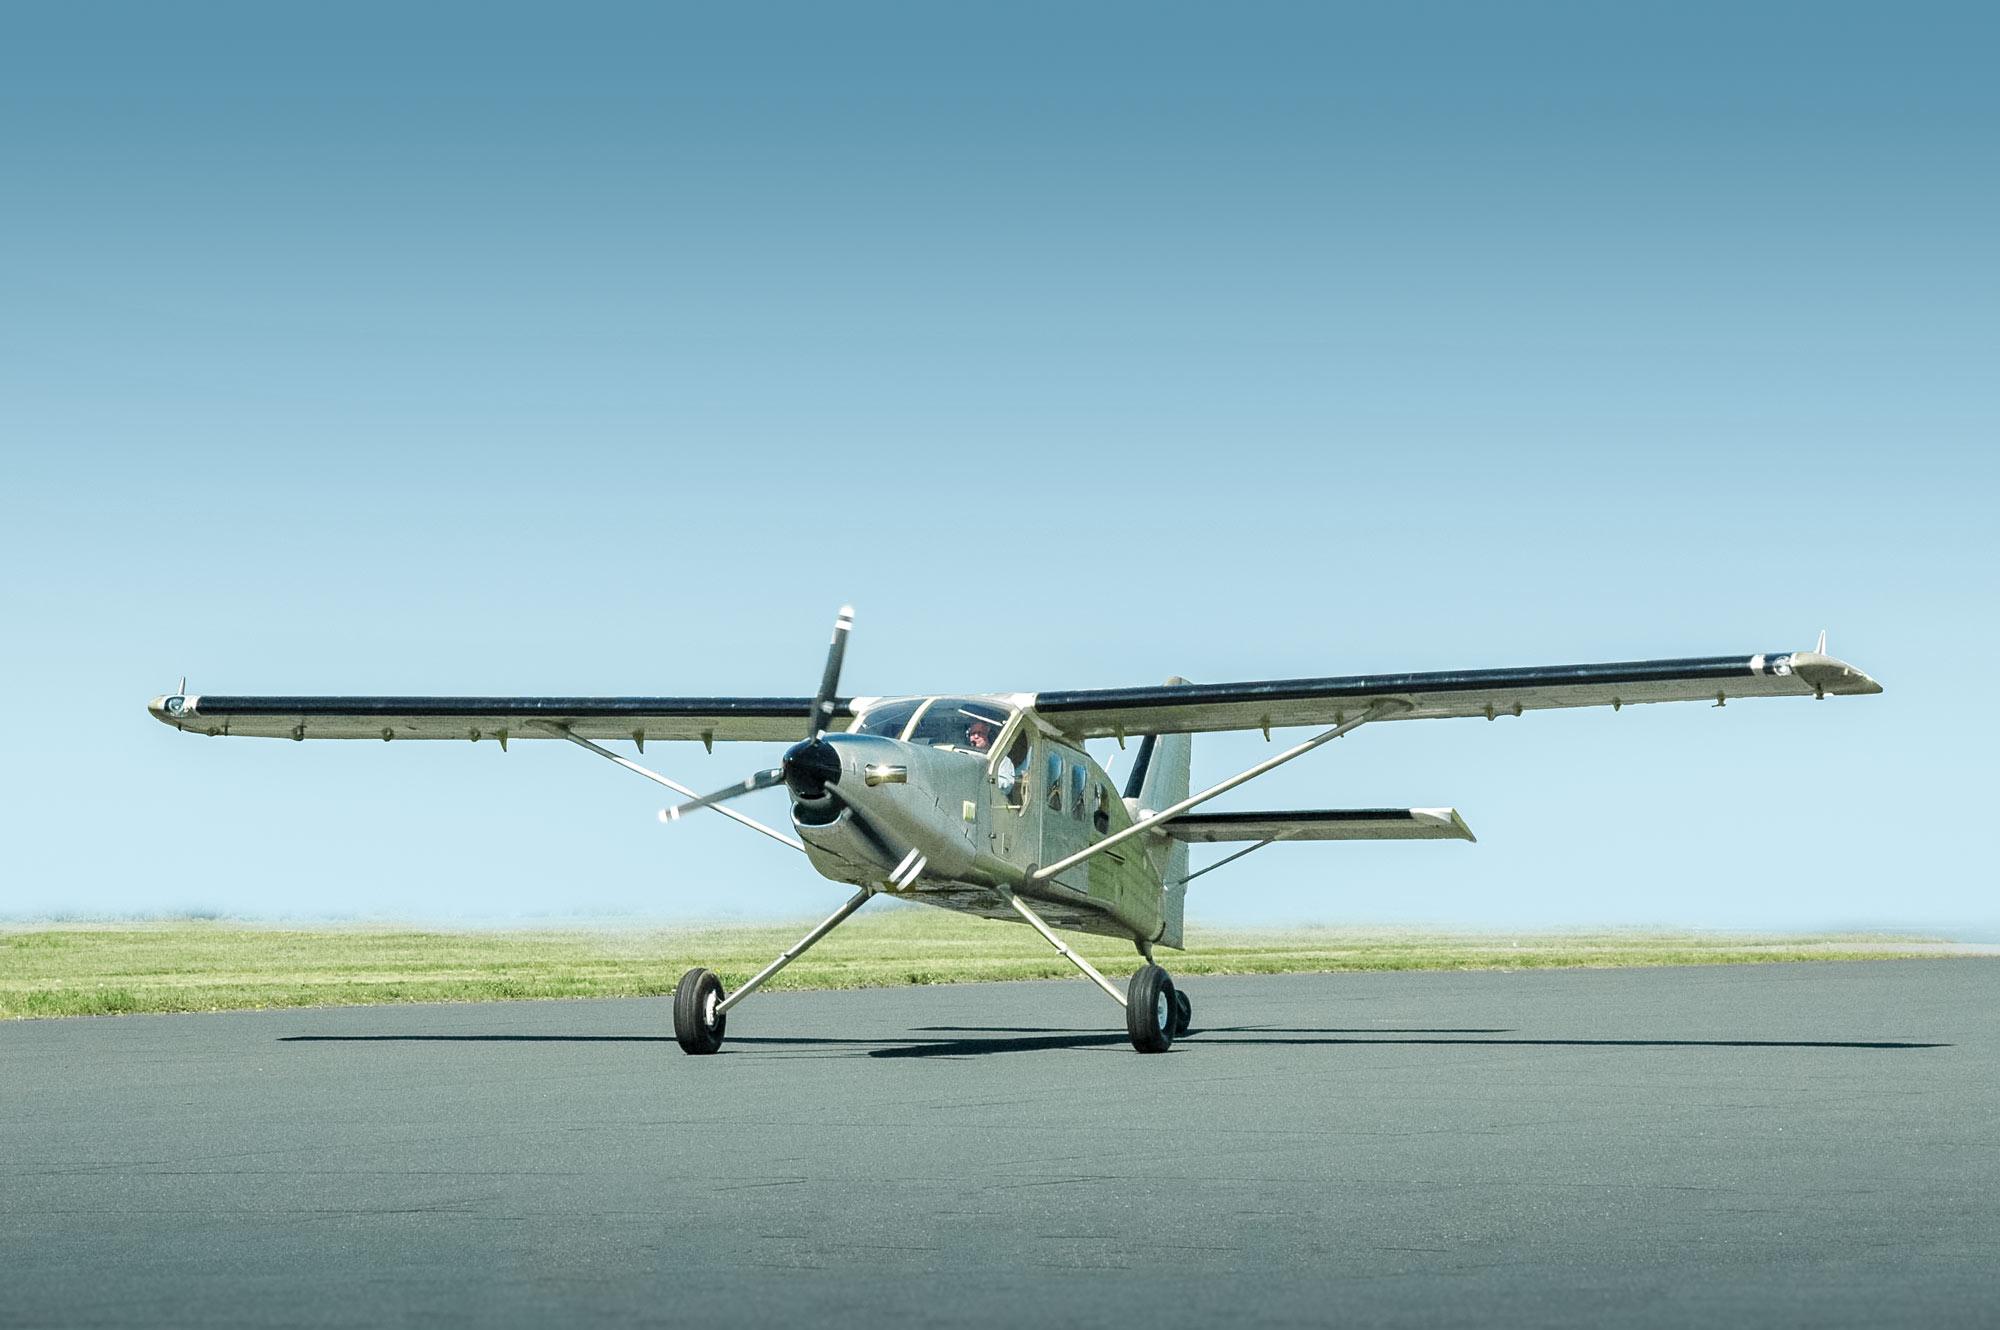 The production of Orbis Avia SM-92T Praga Alfa aircraft project